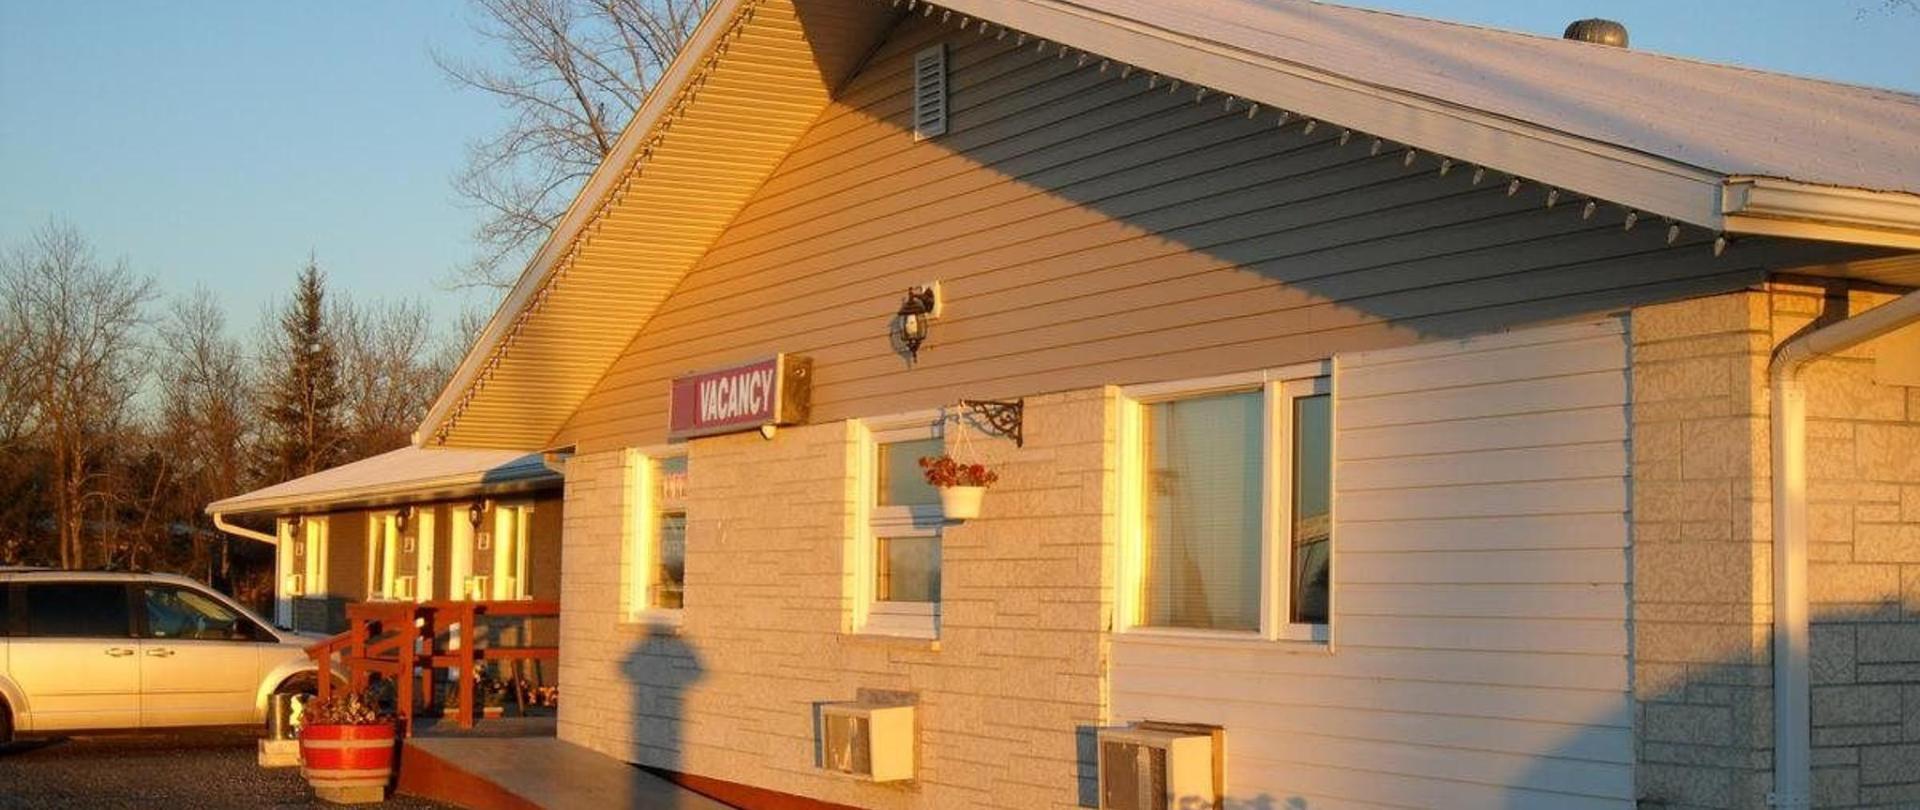 Westway Inn Motel